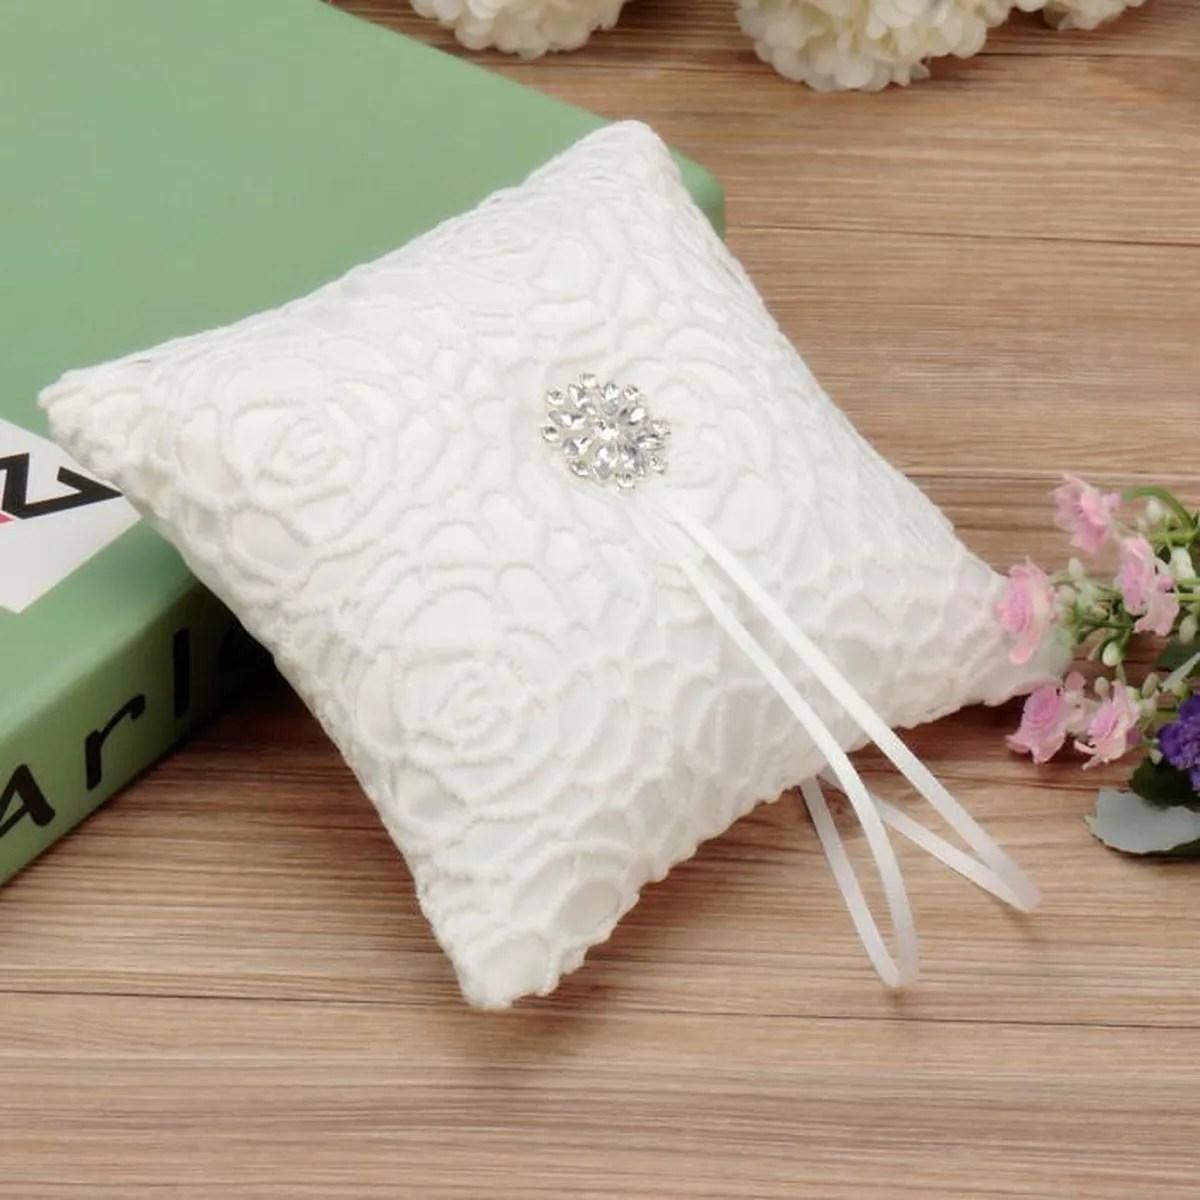 blanc oreiller anneau alliance coussin bague ruban strass floral mariage 15x15cm